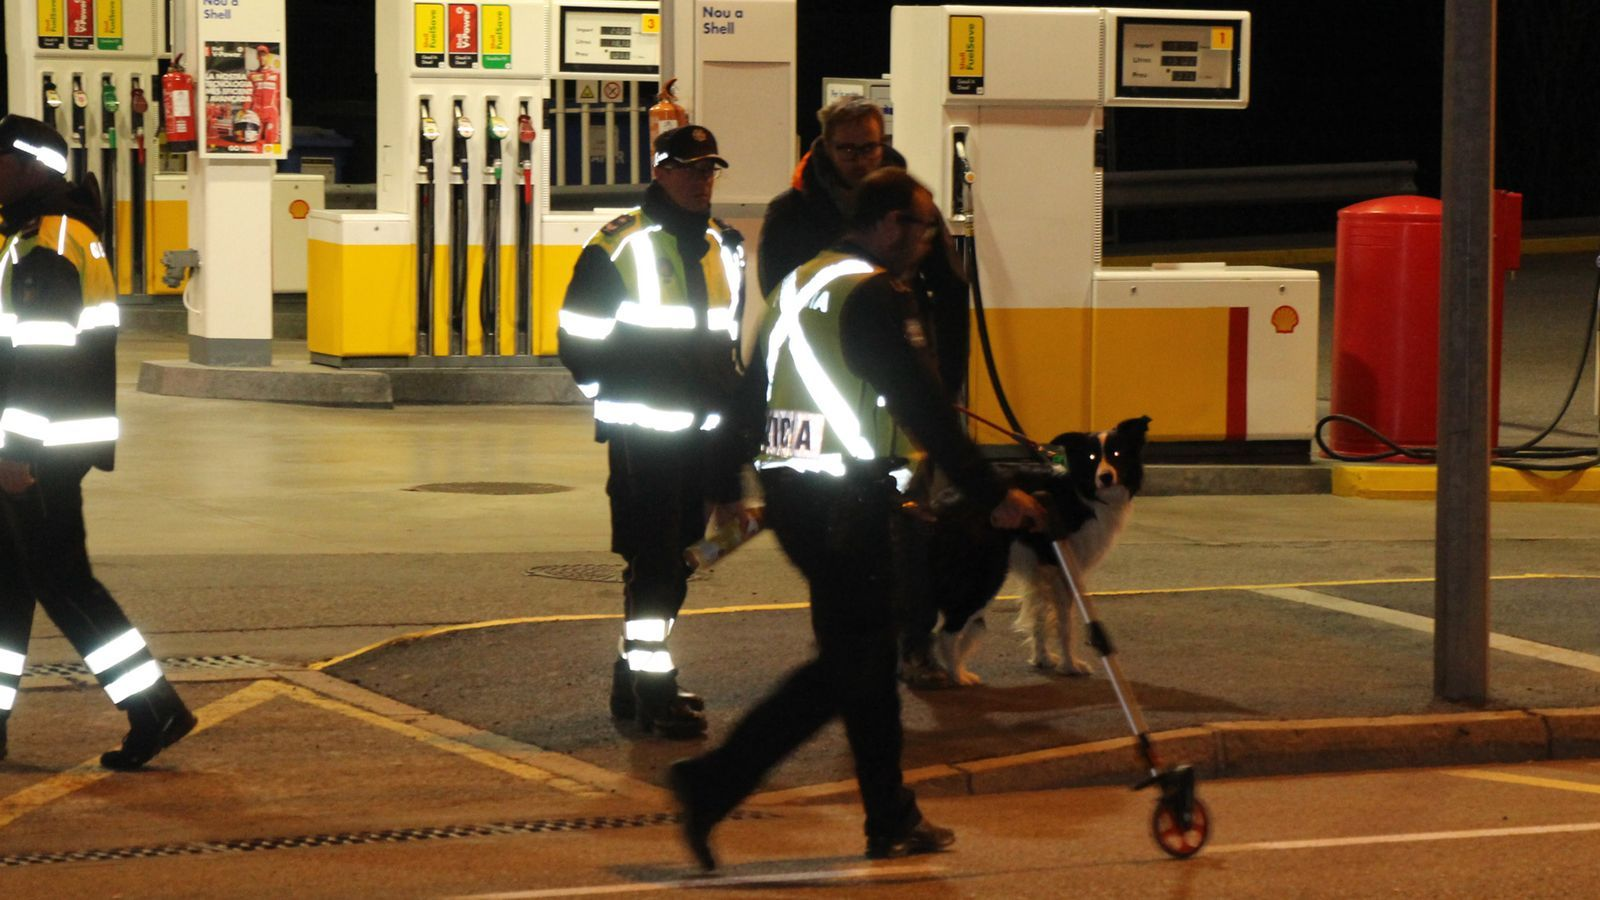 La policia investiga l'escenari on s'ha produït l'accident. / M. R. F.